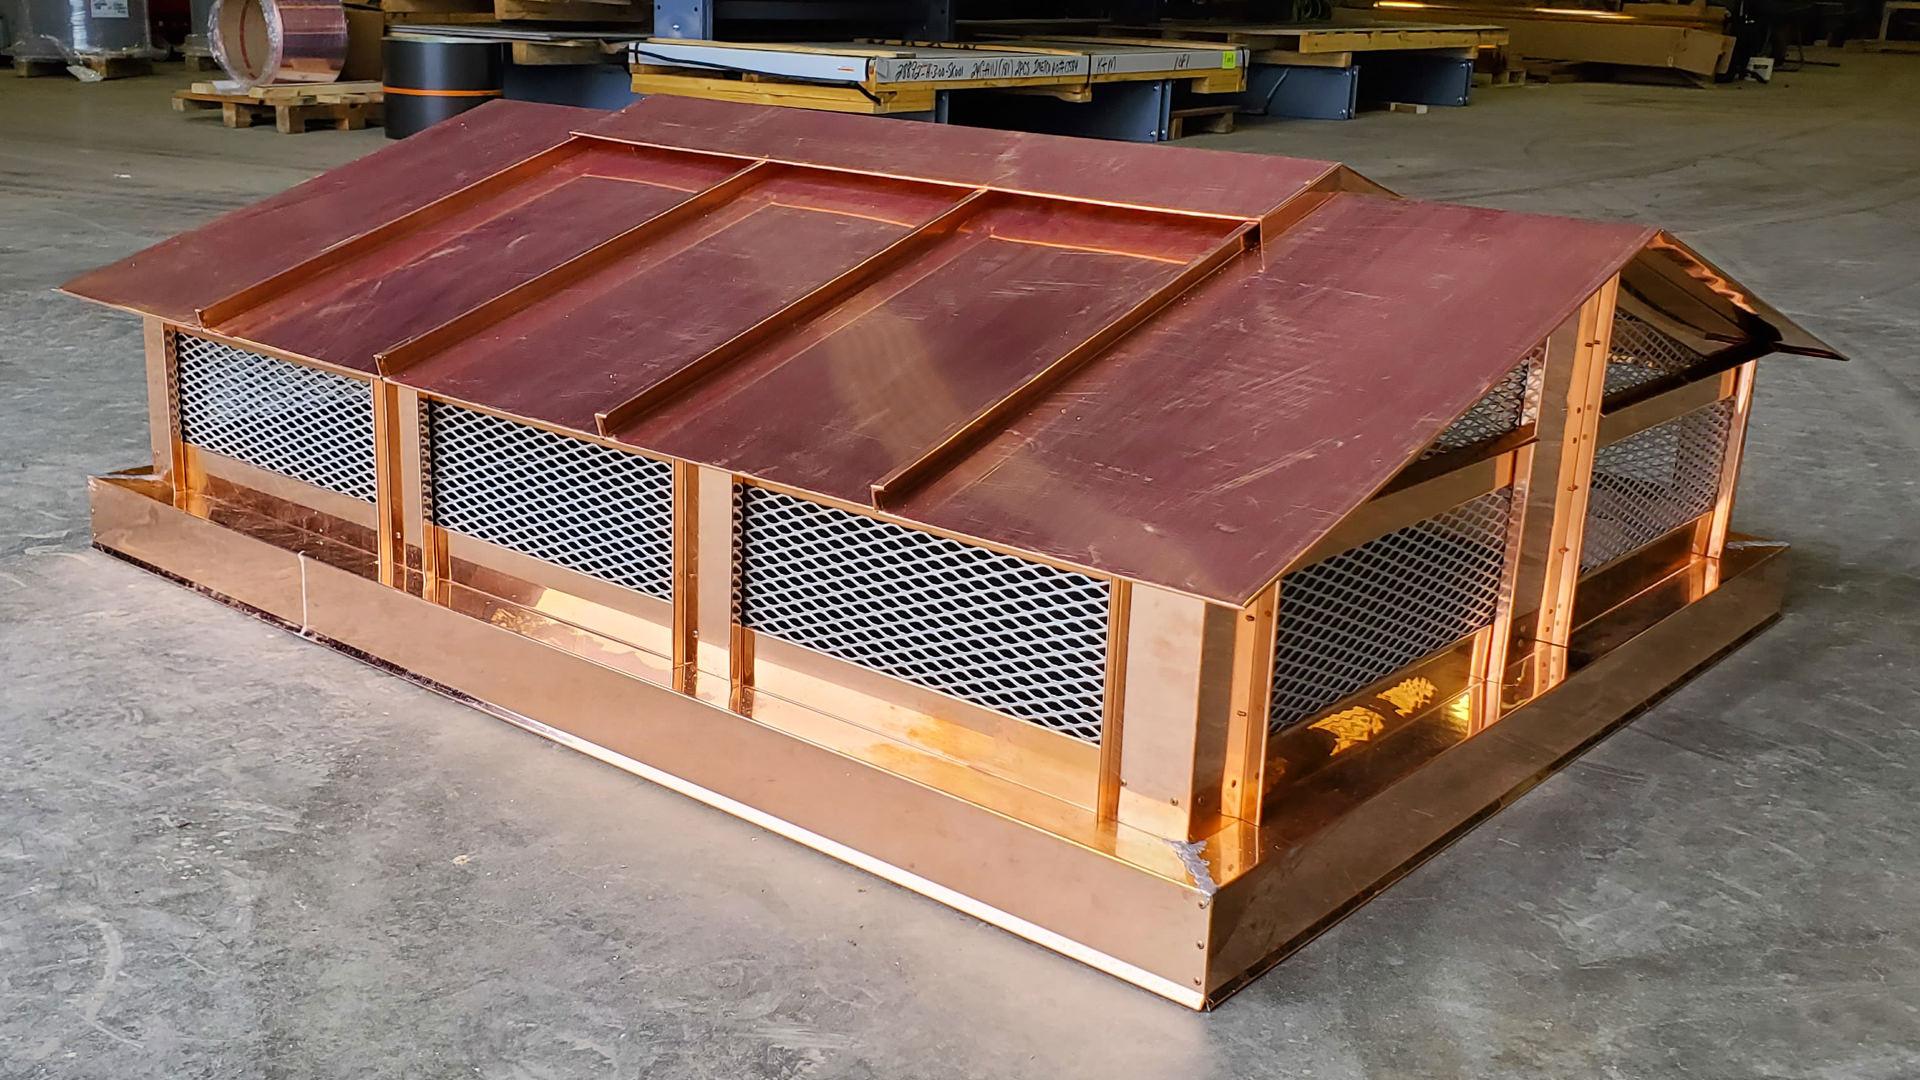 CC102 - Roof rake style standing seam copper chimney cap